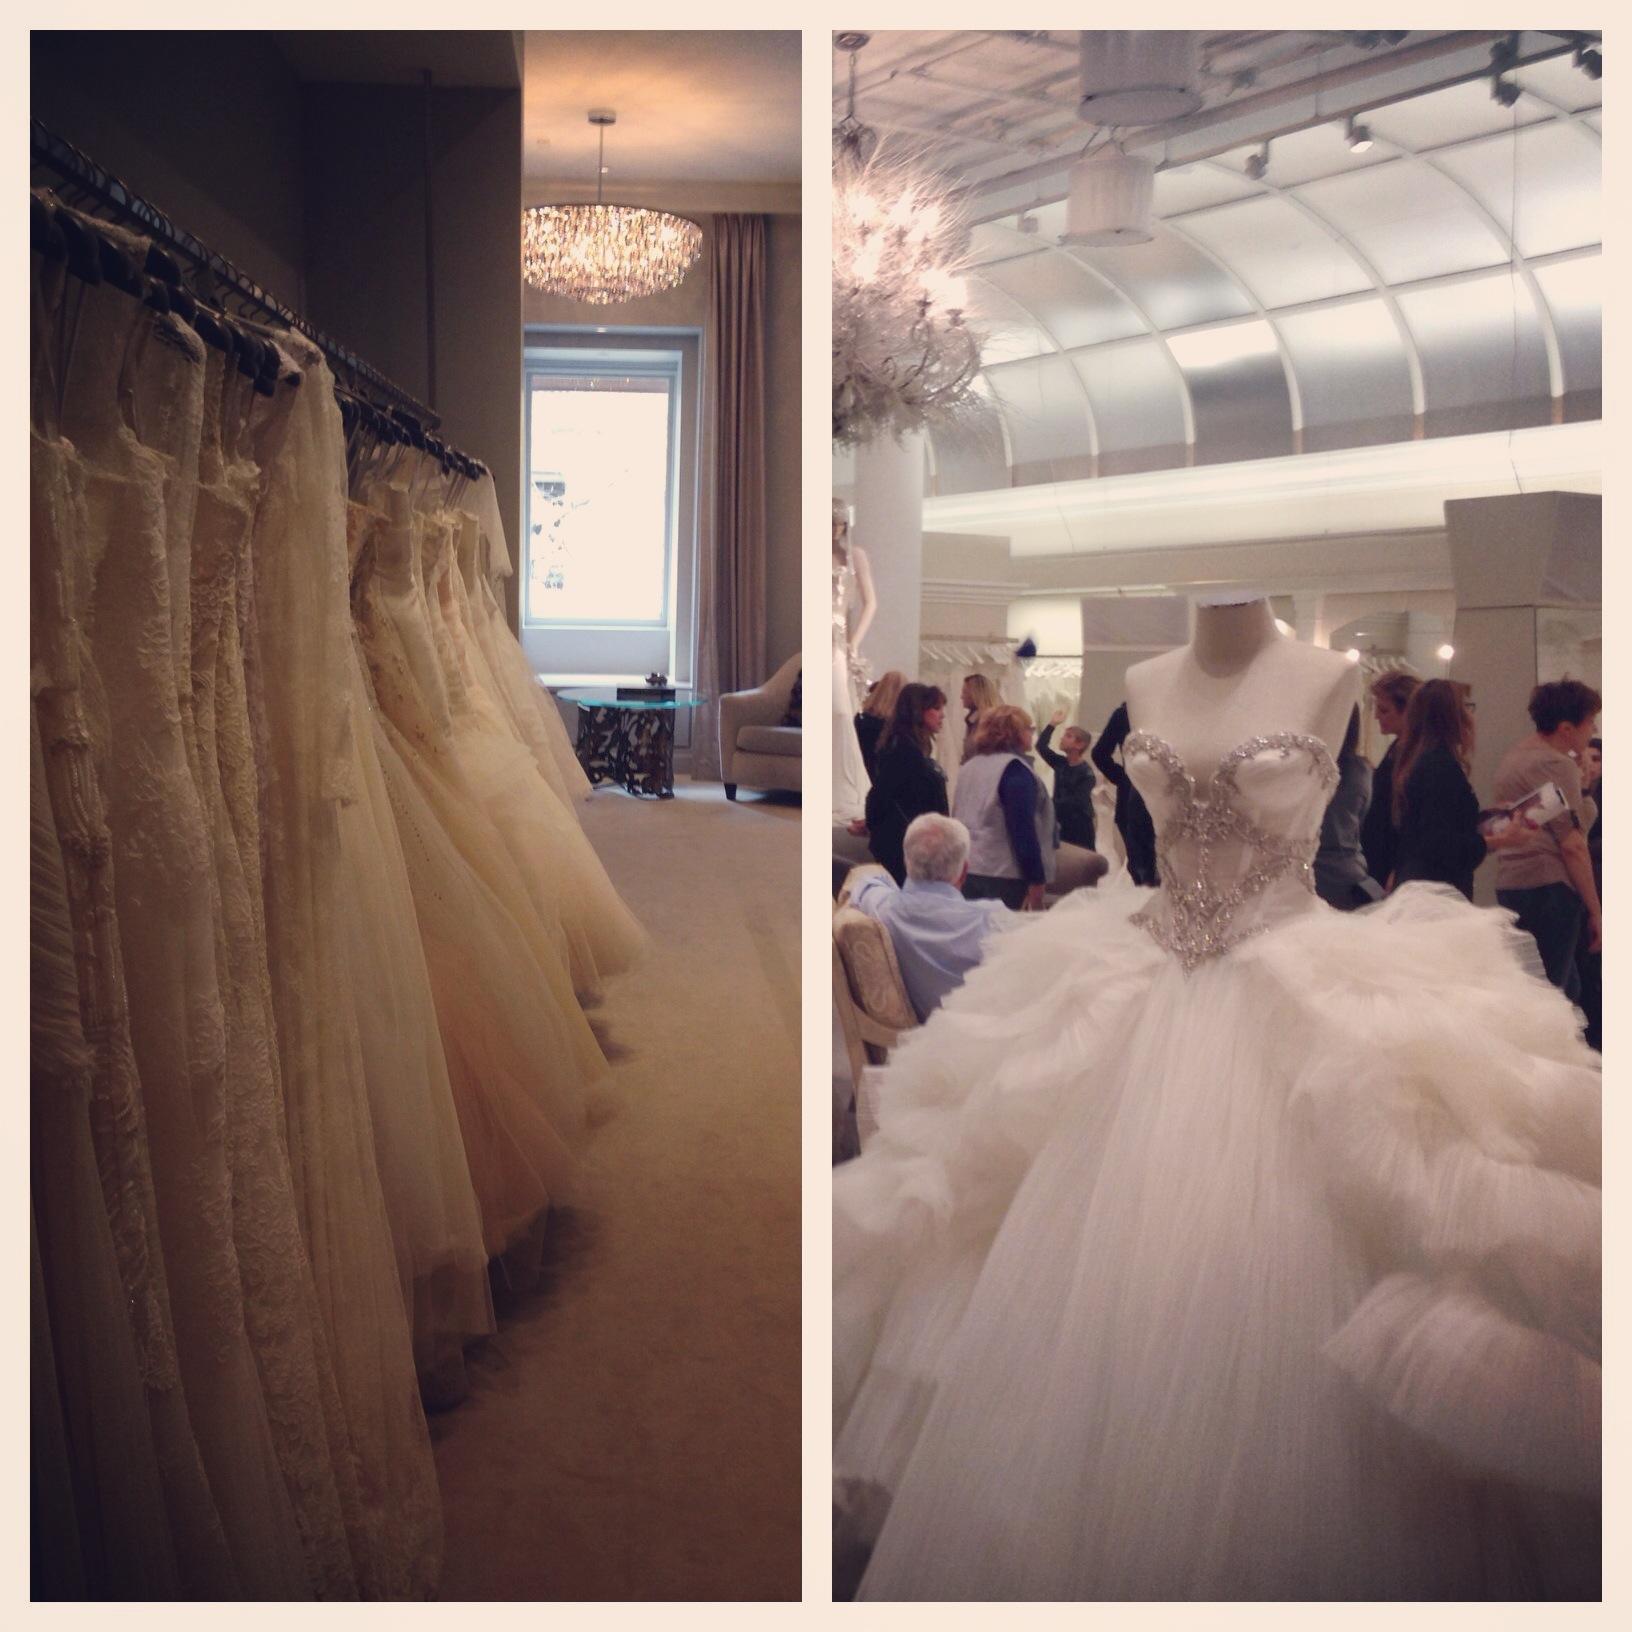 bridal salons 11.23.13